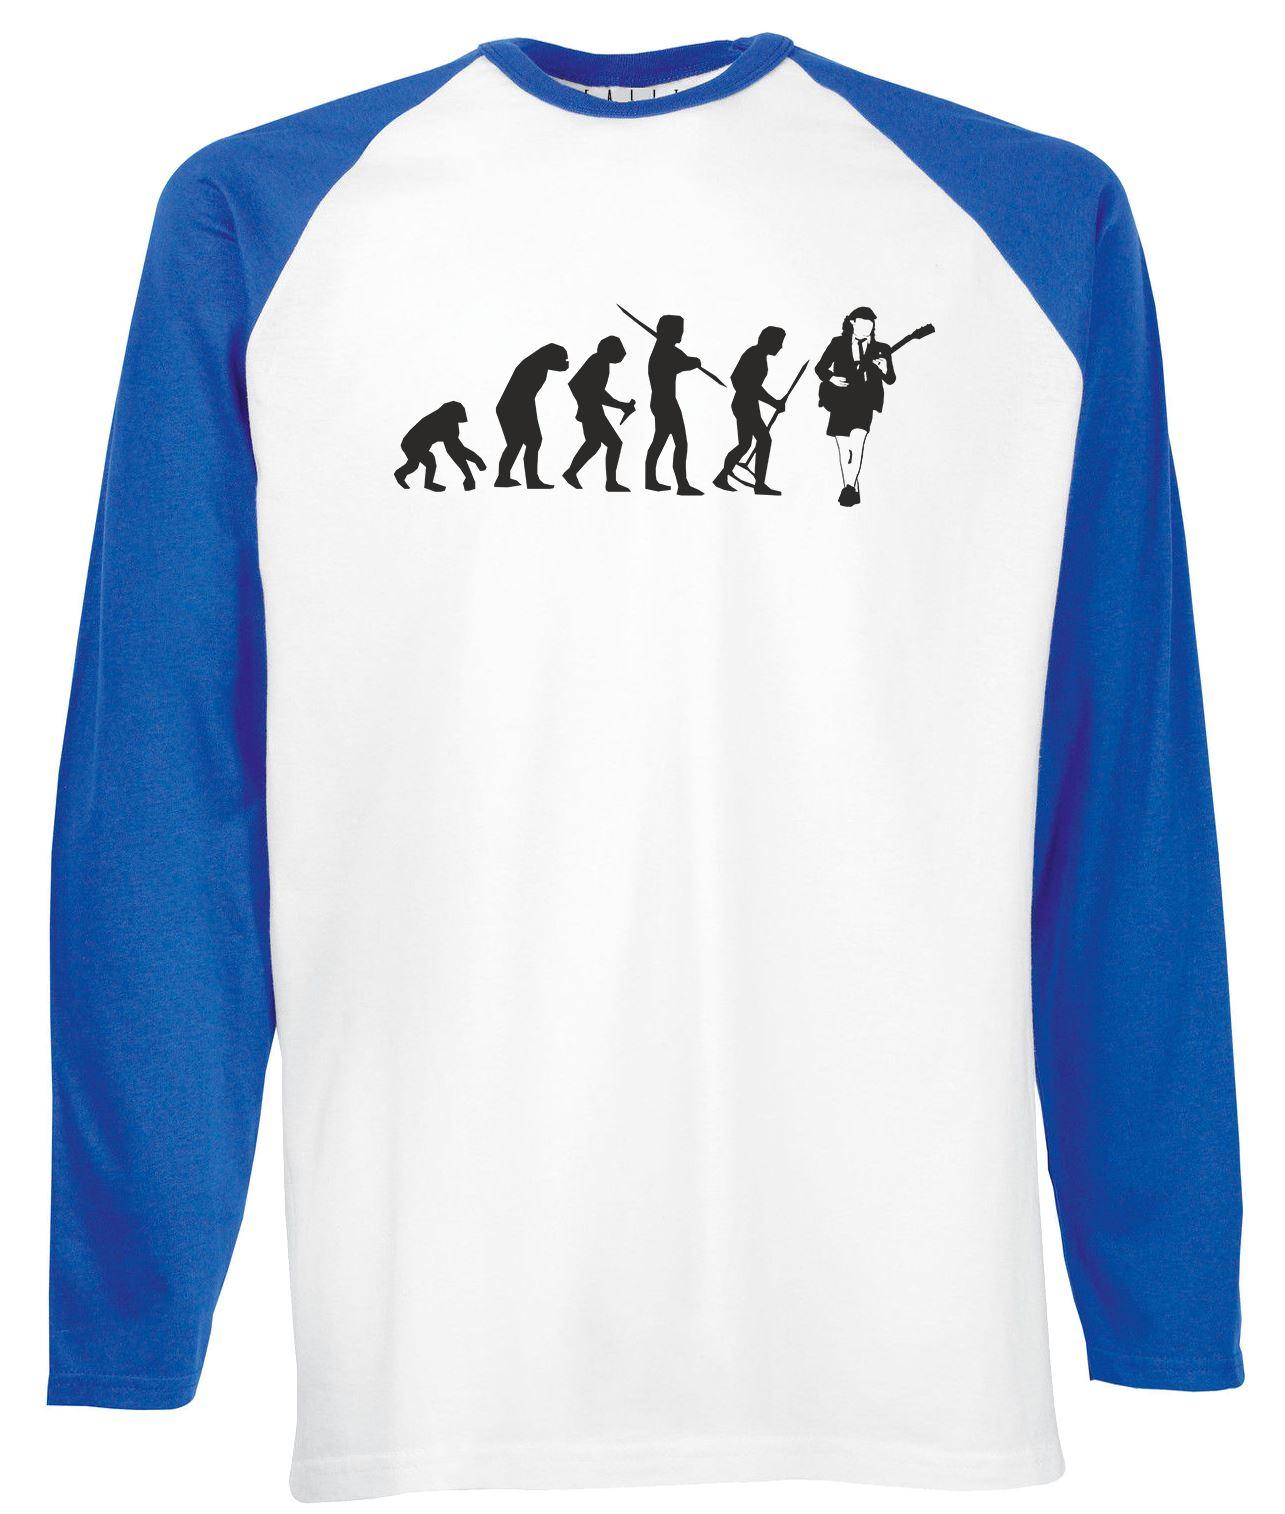 Evolution of Angus Young Long Sleeve Baseball T-Shirt AC DC music rock metal US